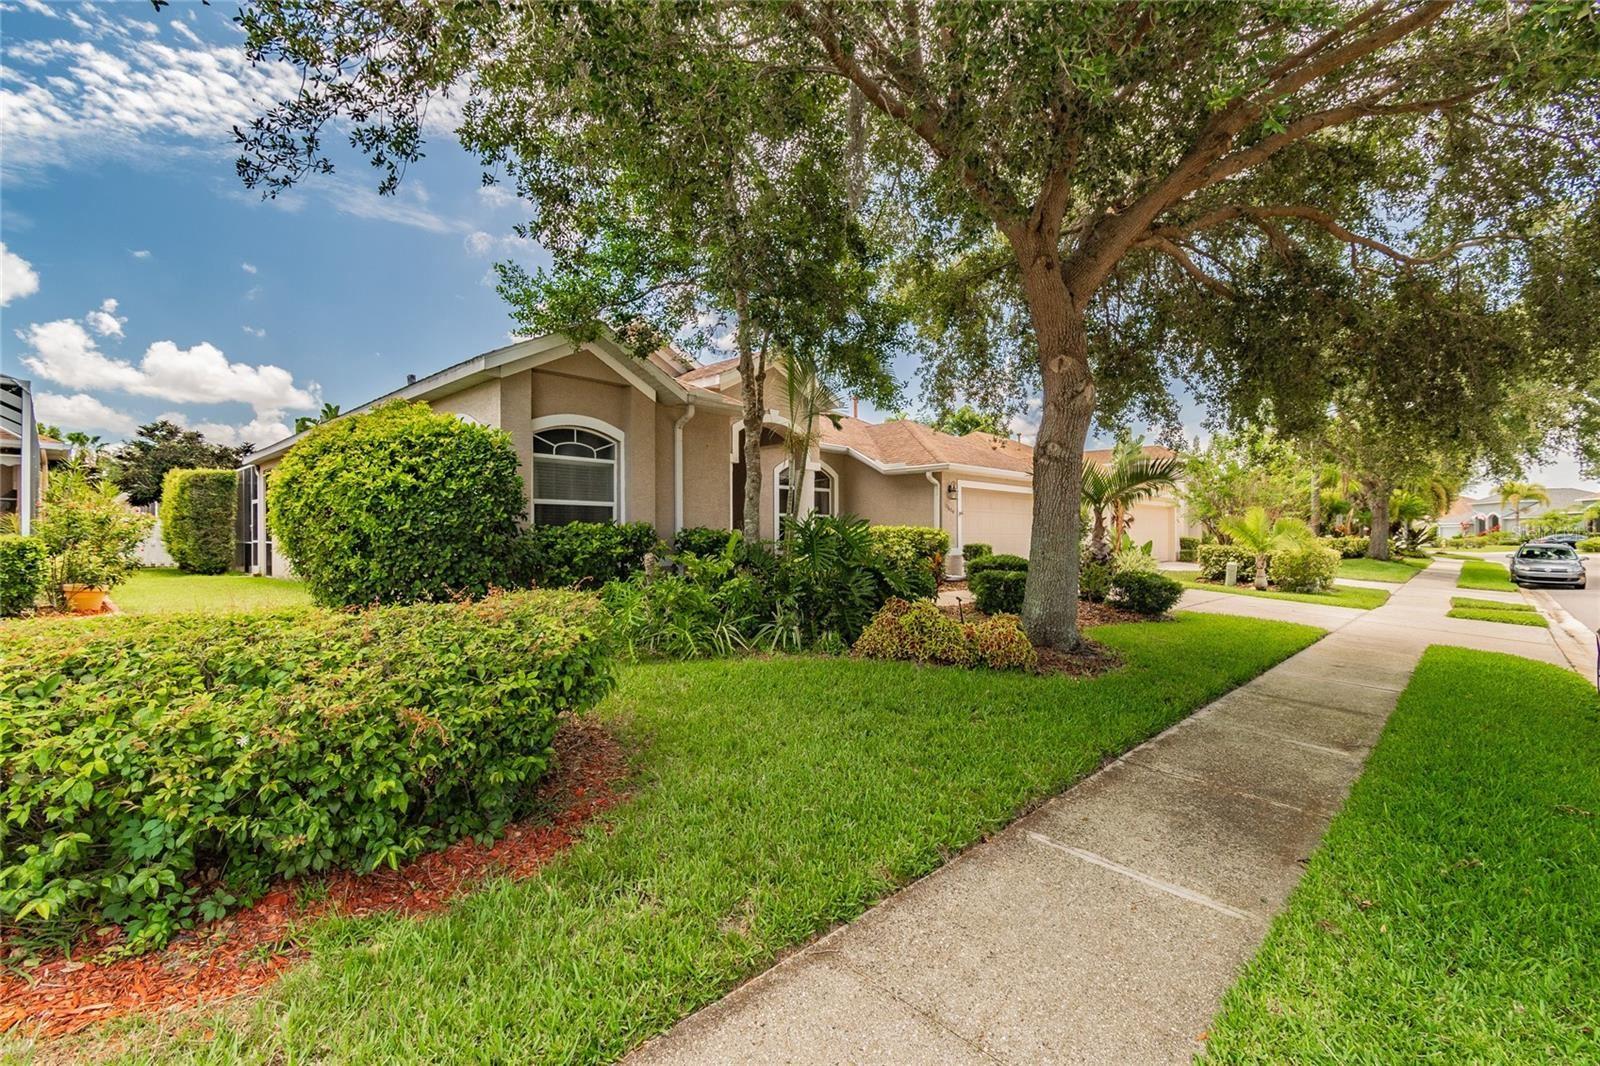 Photo of 10604 OLD GROVE CIRCLE, BRADENTON, FL 34212 (MLS # A4503015)